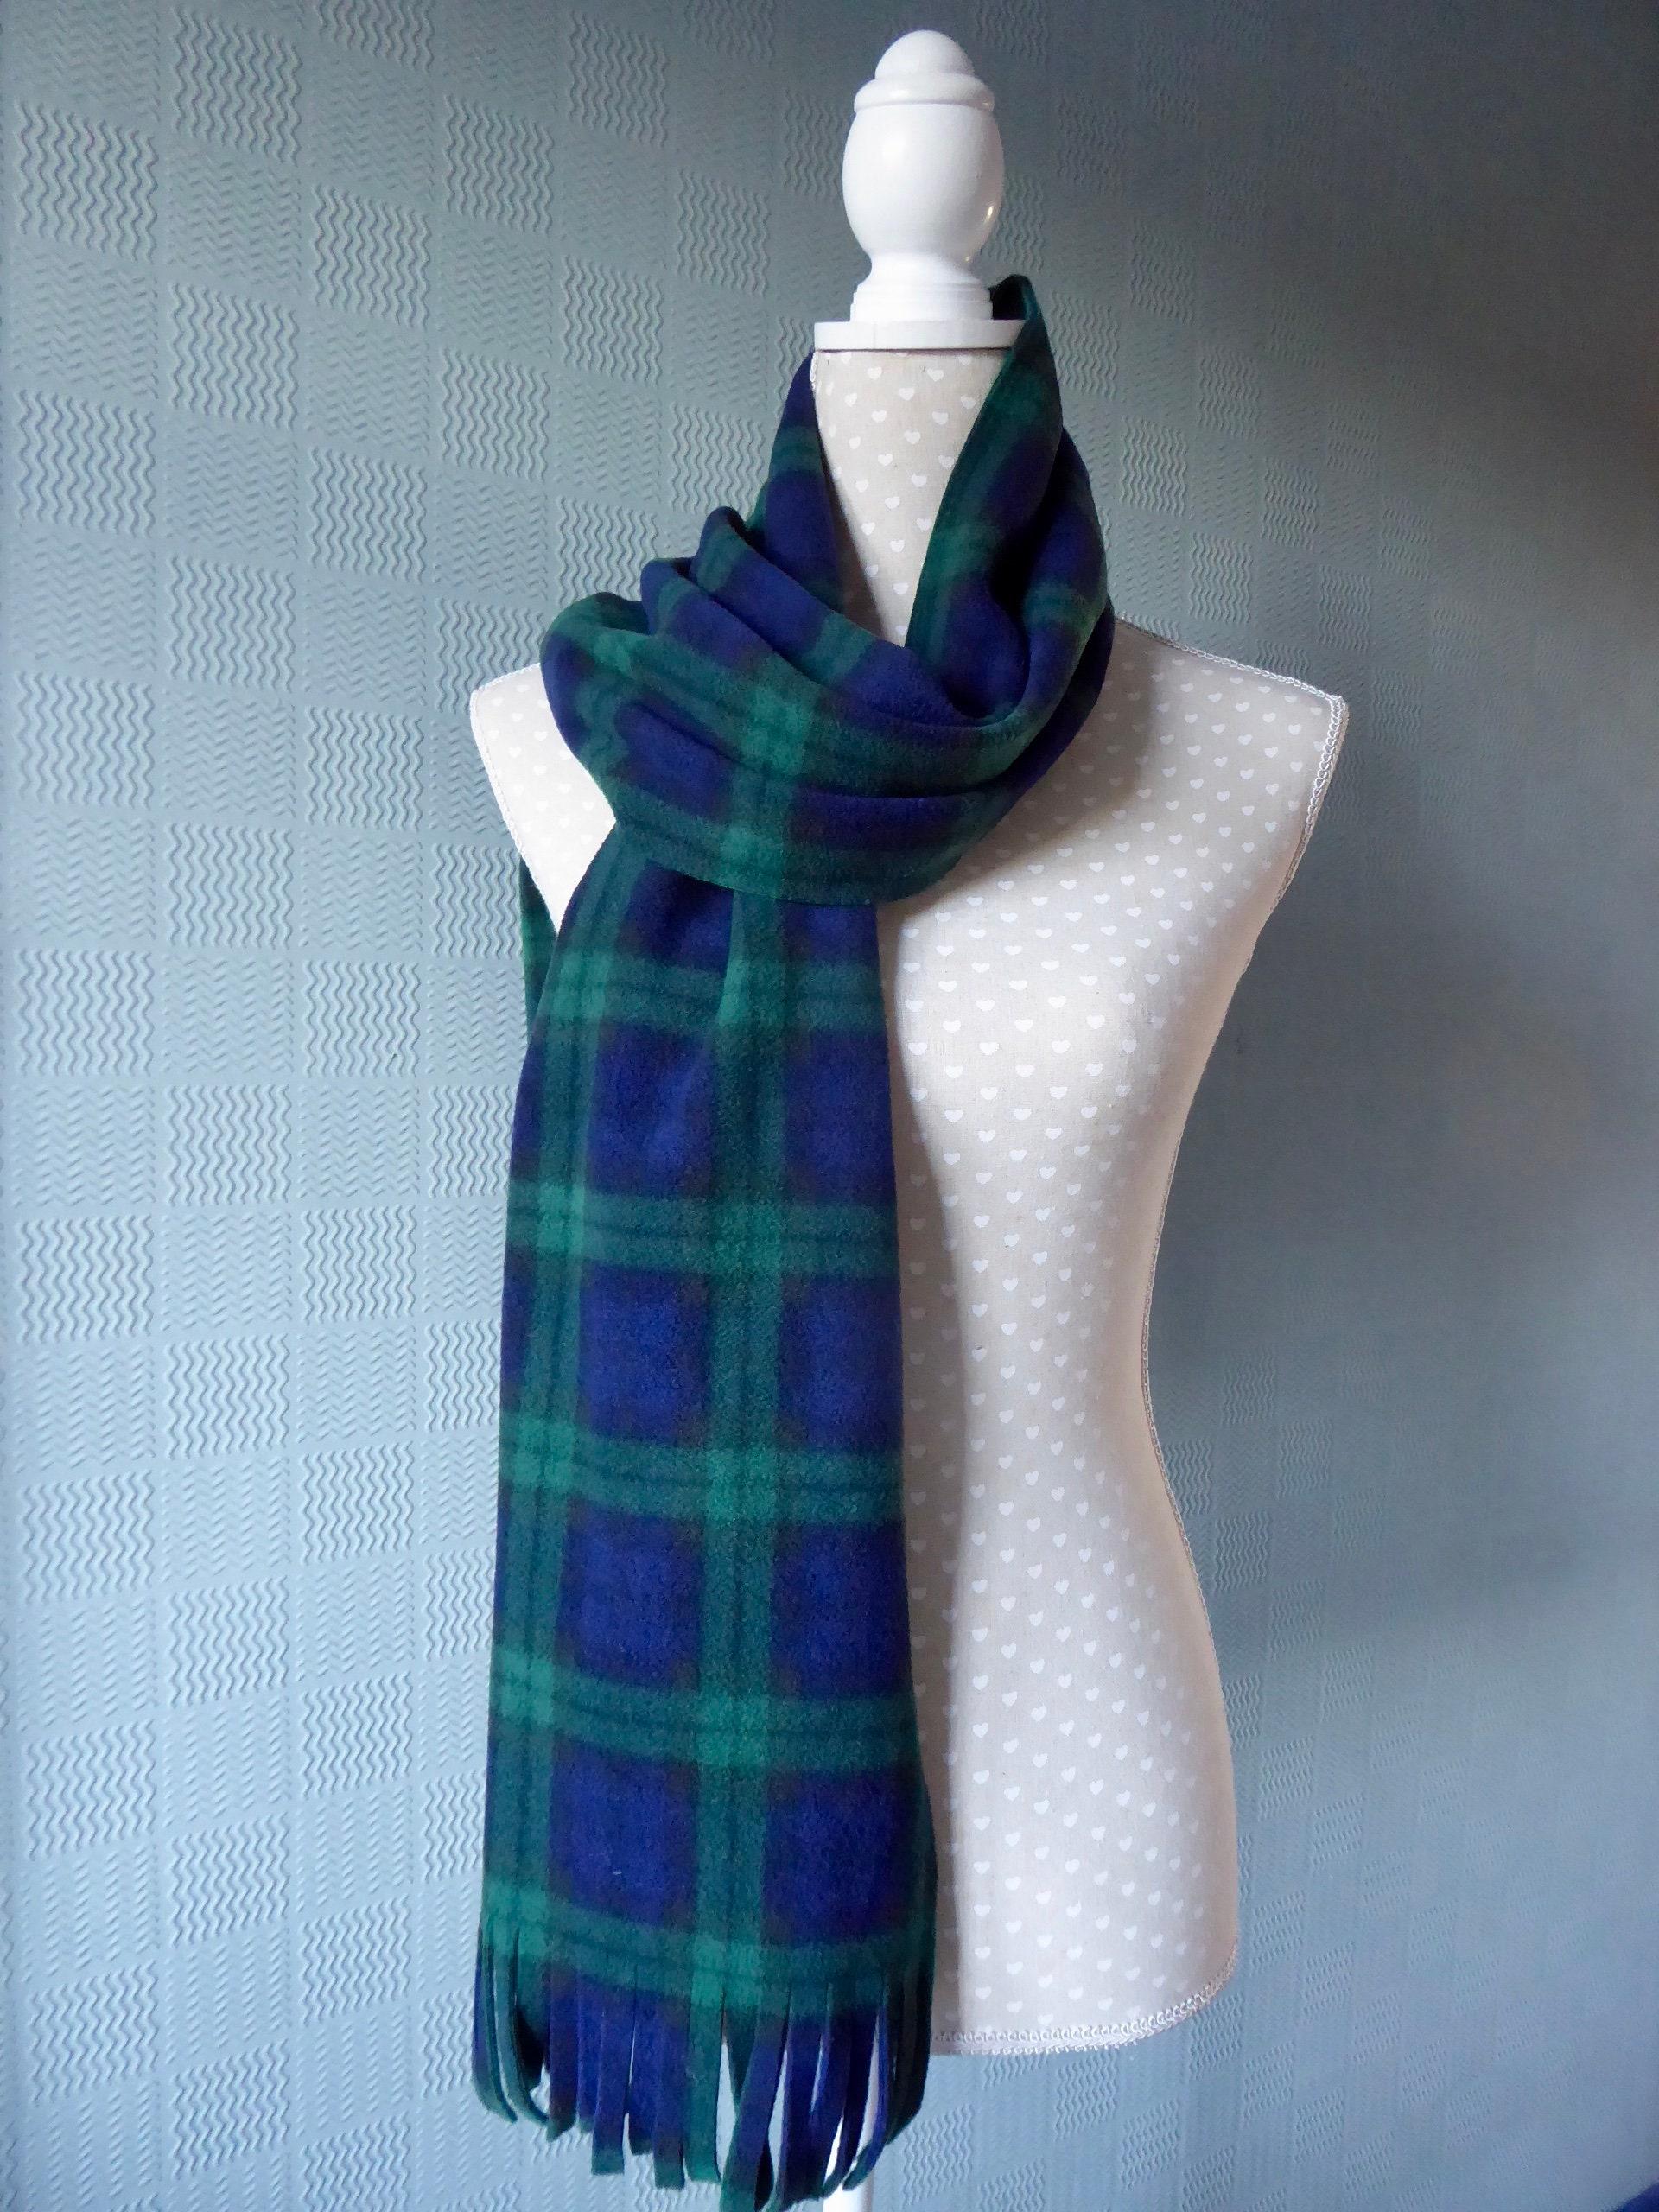 cc8b574206313 Écharpe en tartan bleu et vert enveloppement Black Watch | Etsy